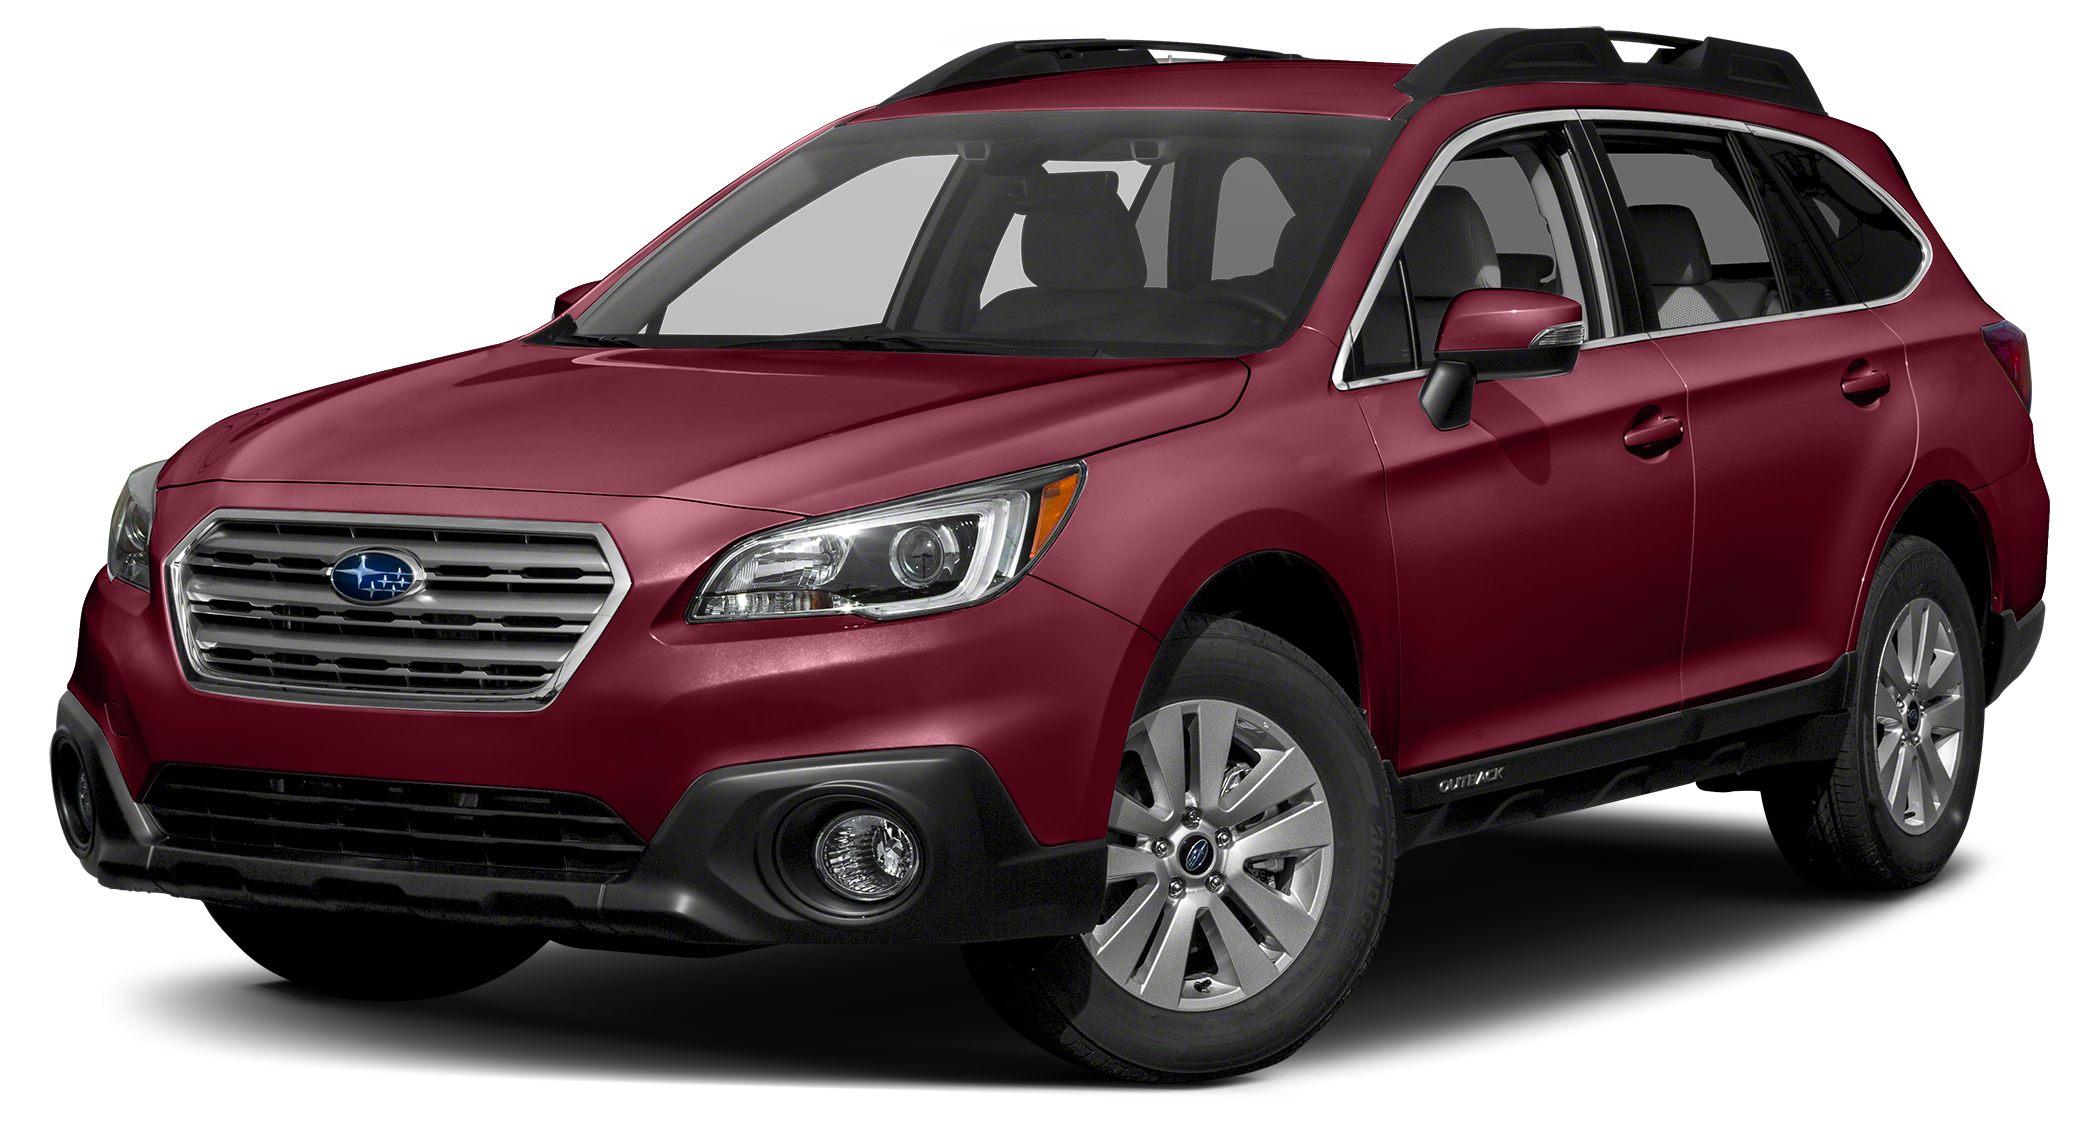 2017 Subaru Outback 25i Premium Miles 5Color Venetian Red Pearl Stock 17U199 VIN 4S4BSAHC0H